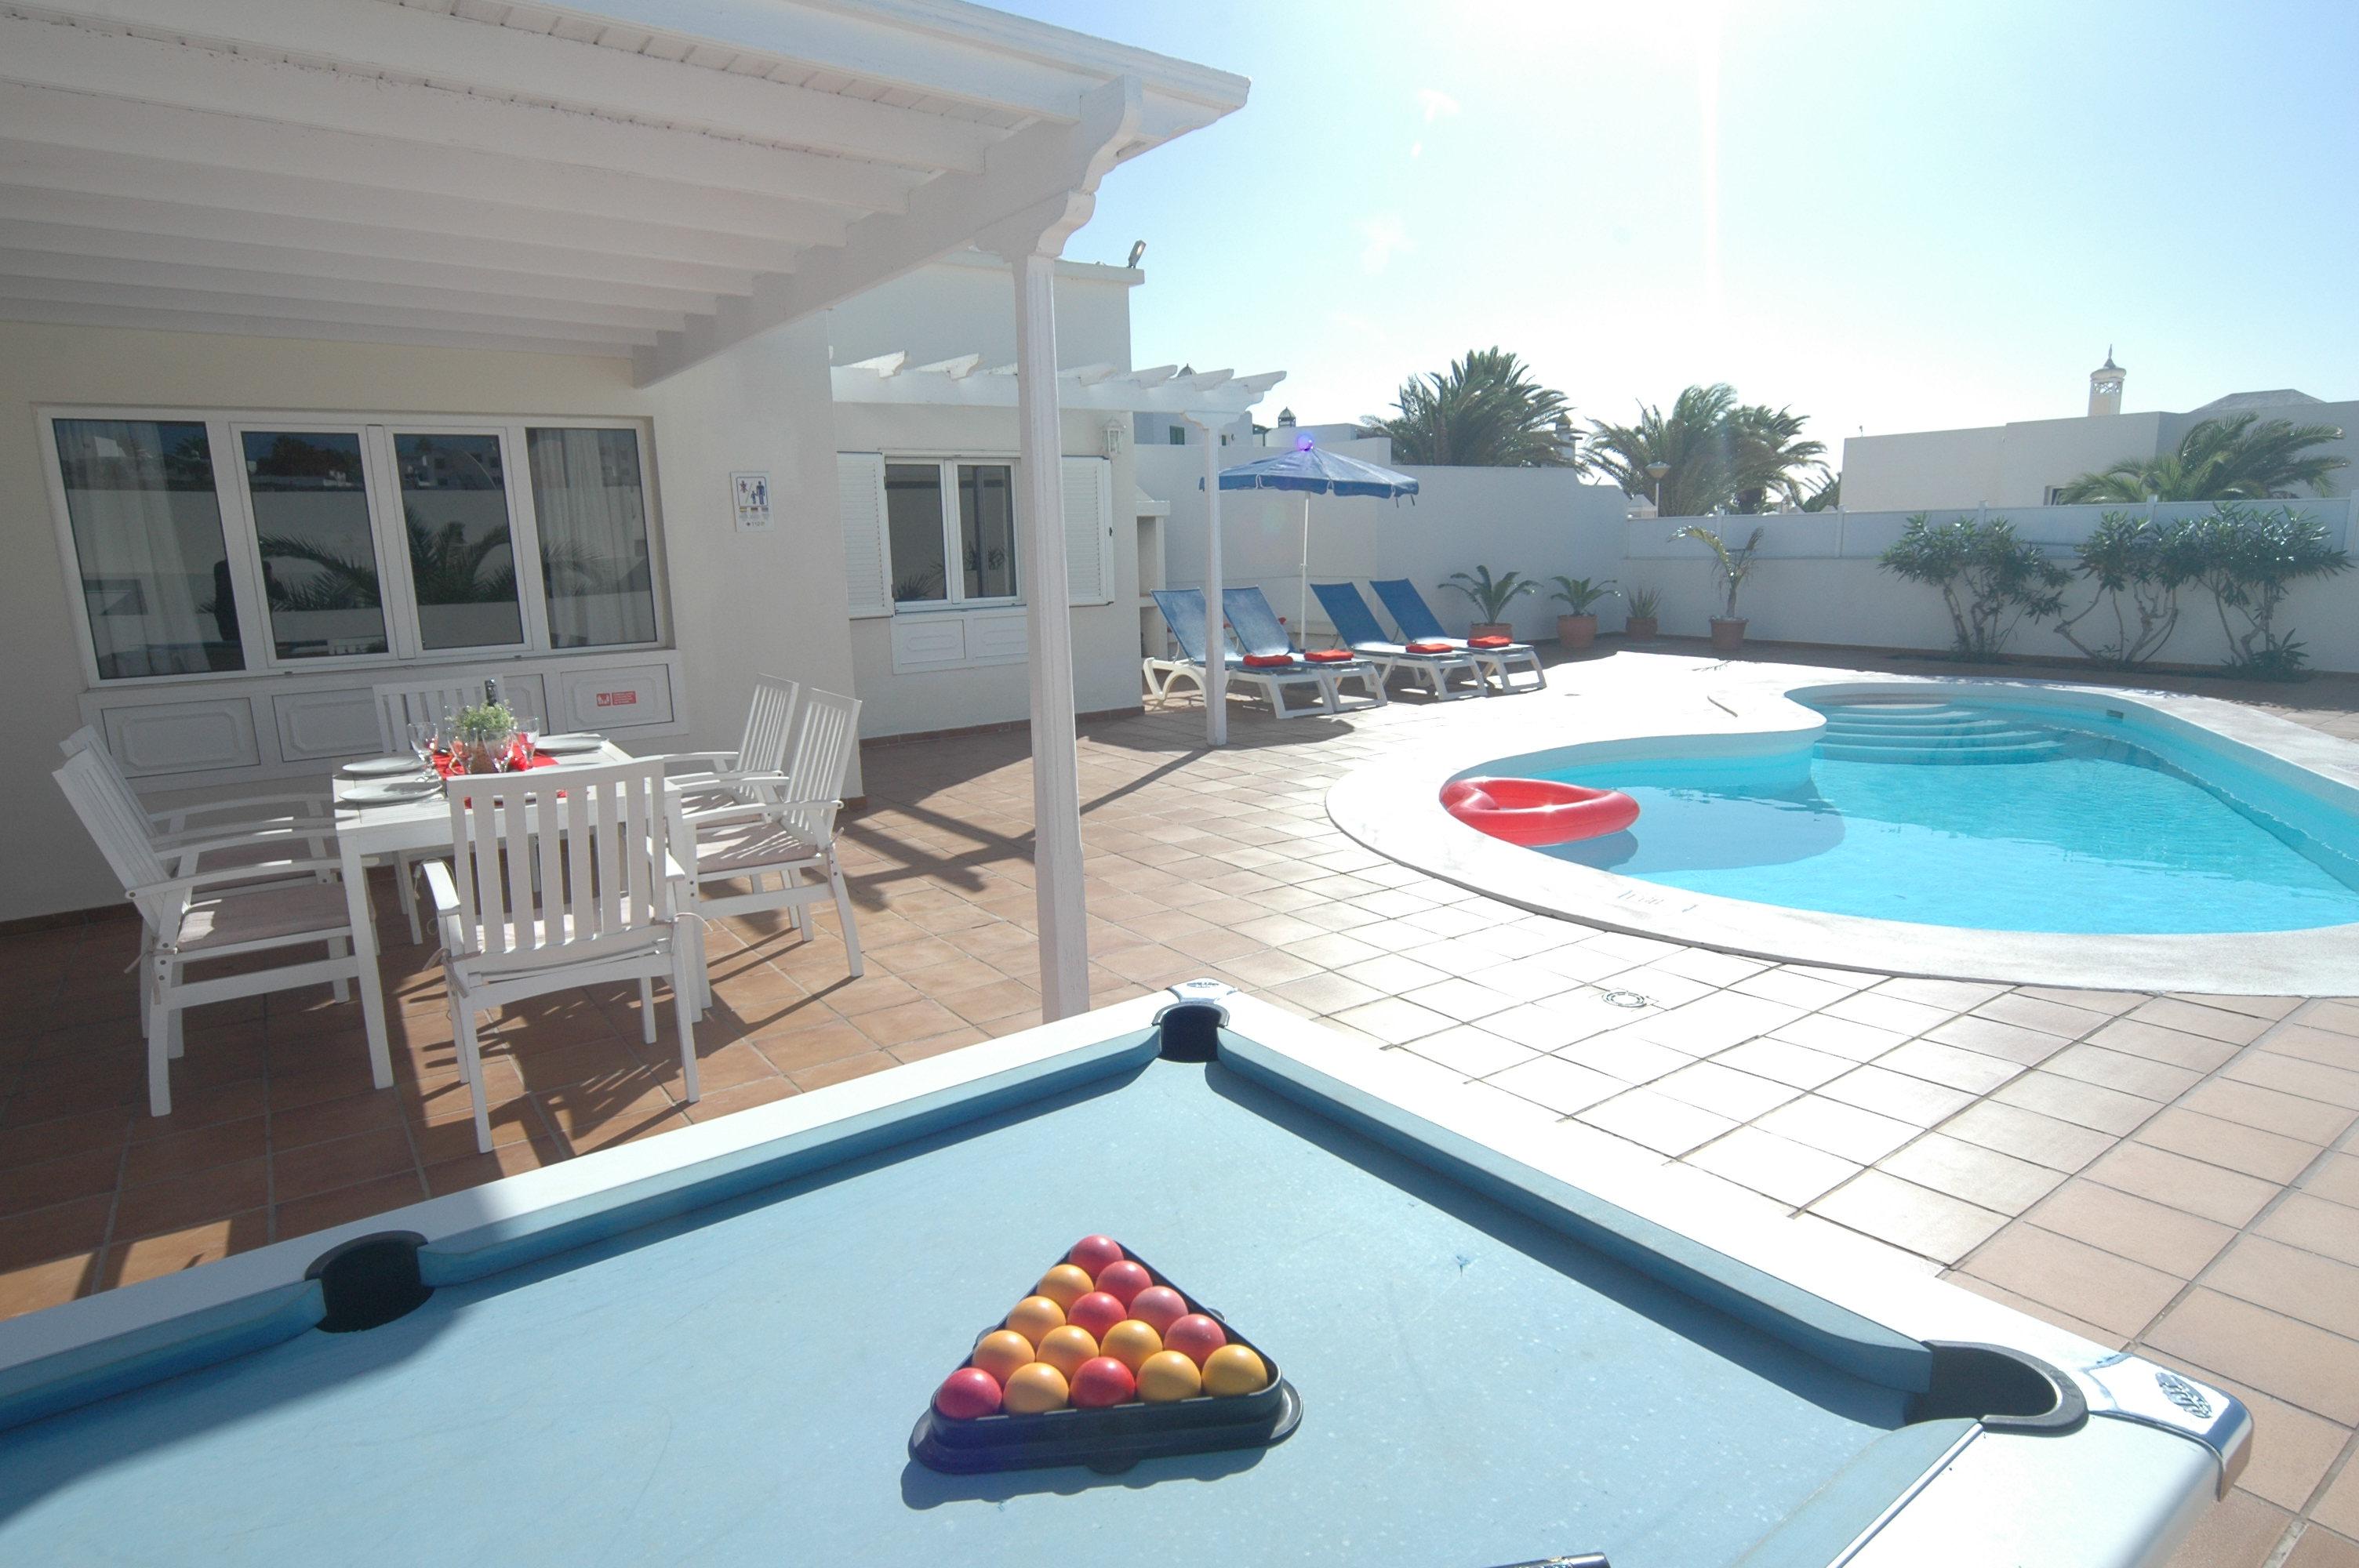 LVC311571 Villa with pool table in Matagorda